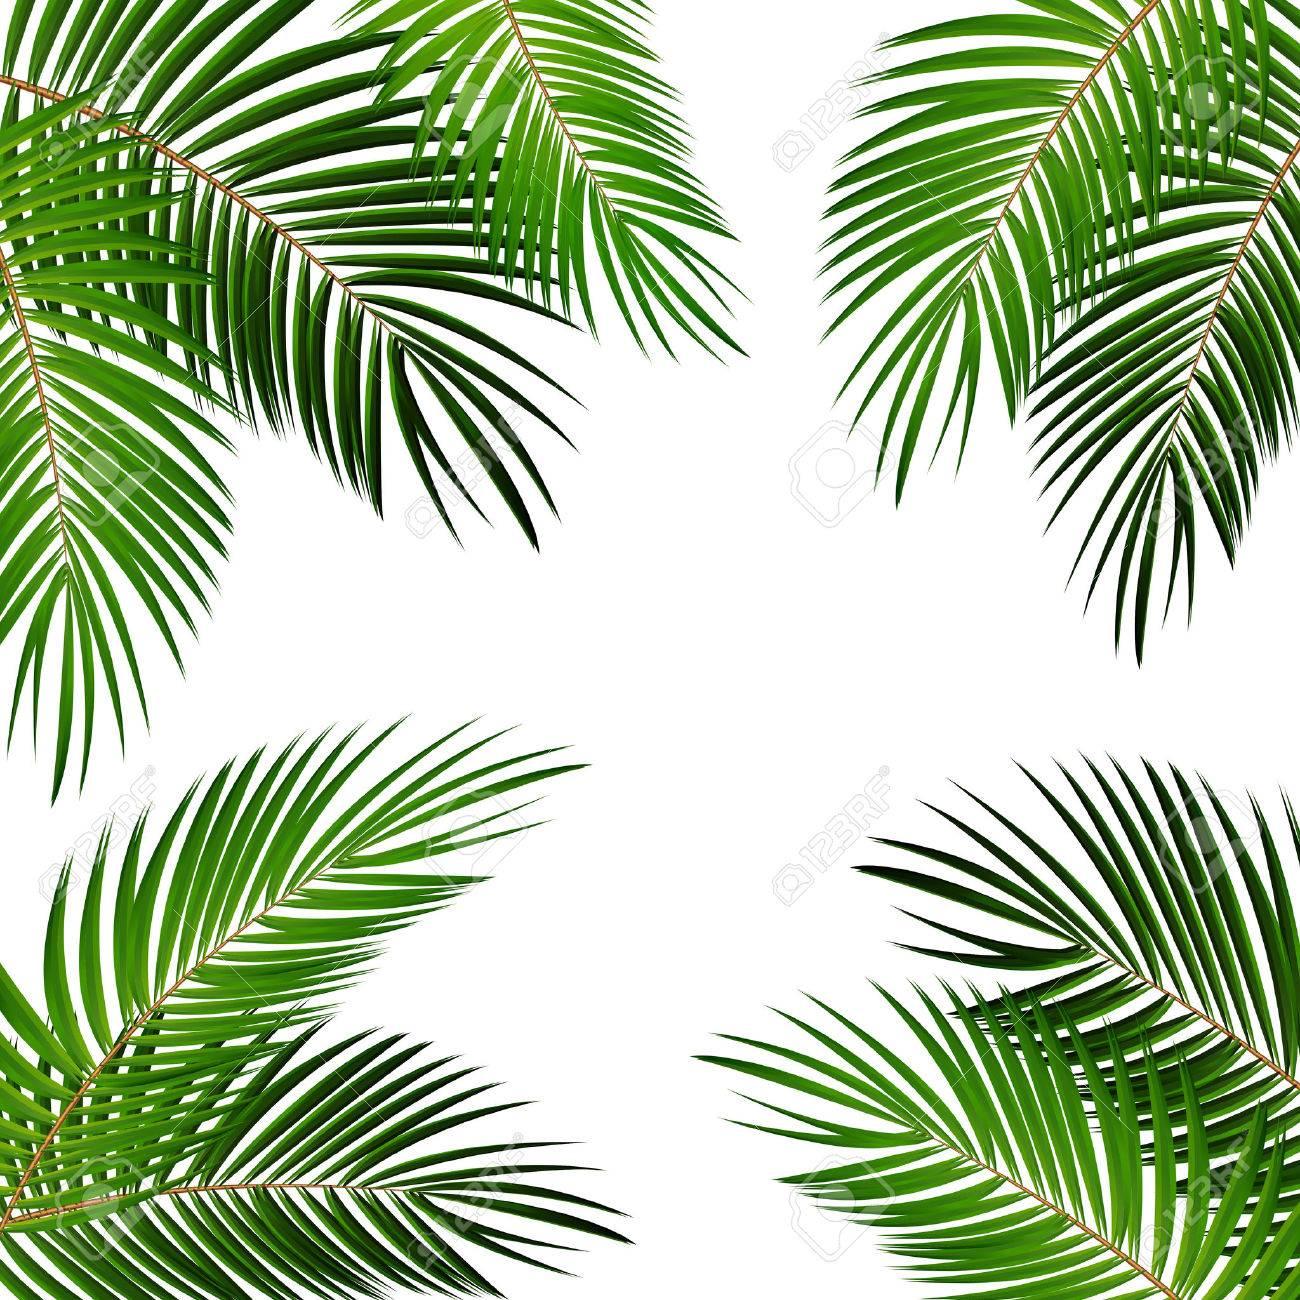 palm leaf vector background illustration eps10 royalty free cliparts rh 123rf com palm leaf vector pattern palm leaf vector background